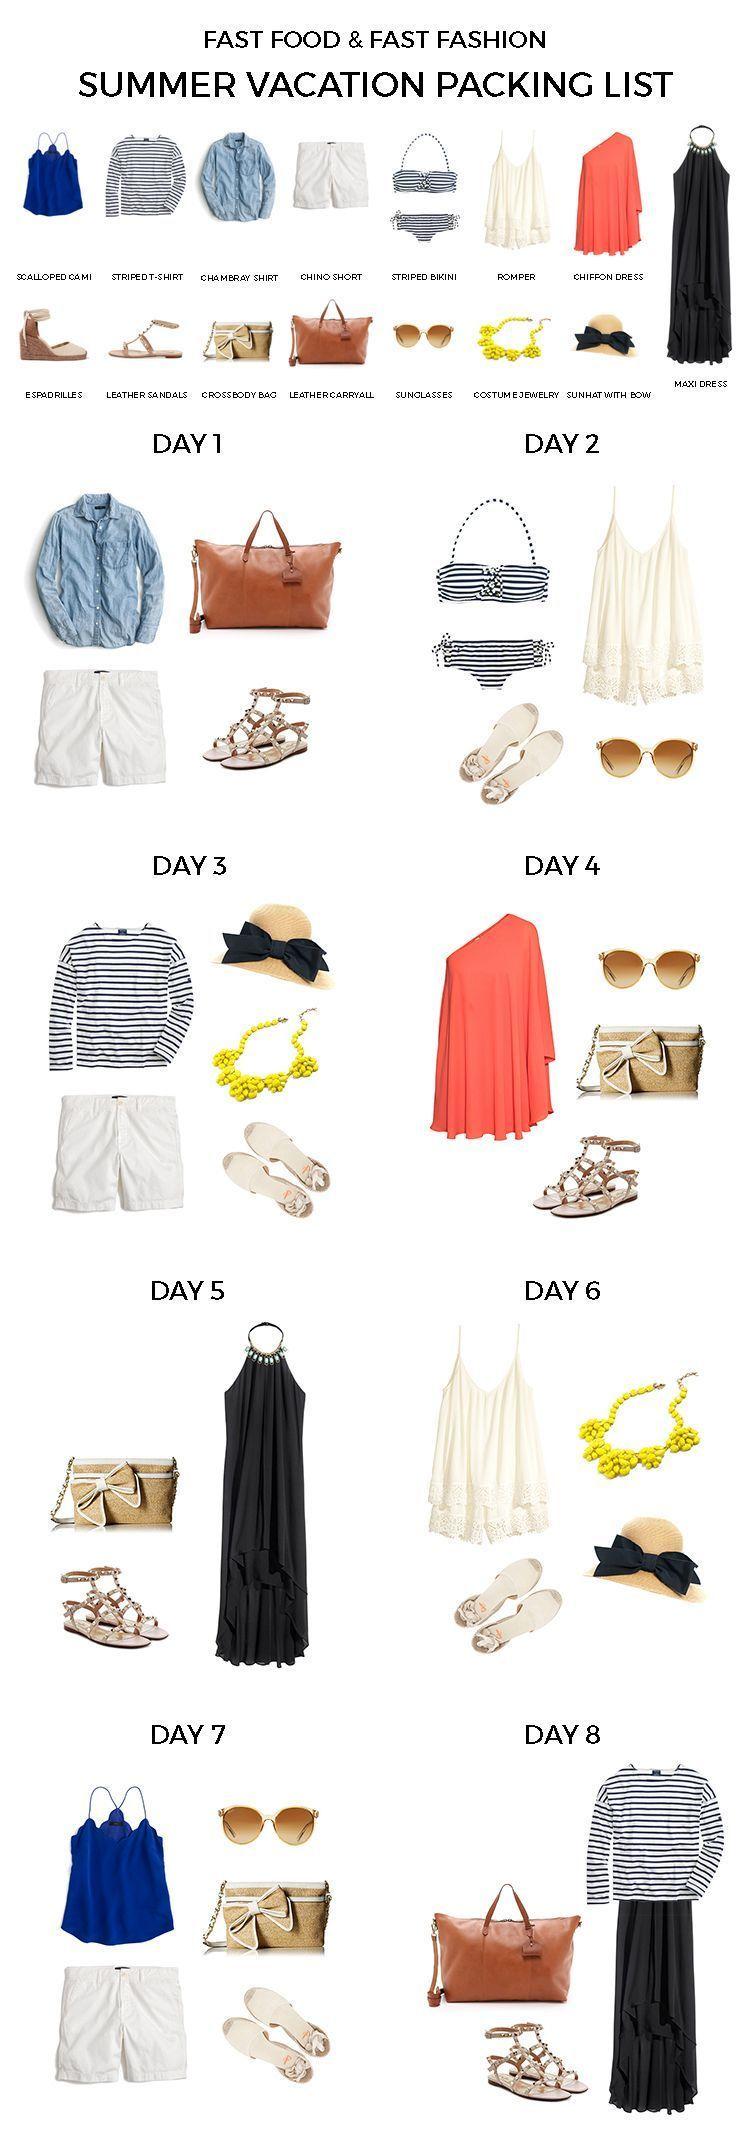 Summer vacation packing list | spain holiday | ropa para viaje #travelwardrobesummer Summer vacation packing list travel clothes summer, travel wardrobe summer, beach wardrobe, travel #travelwardrobesummer